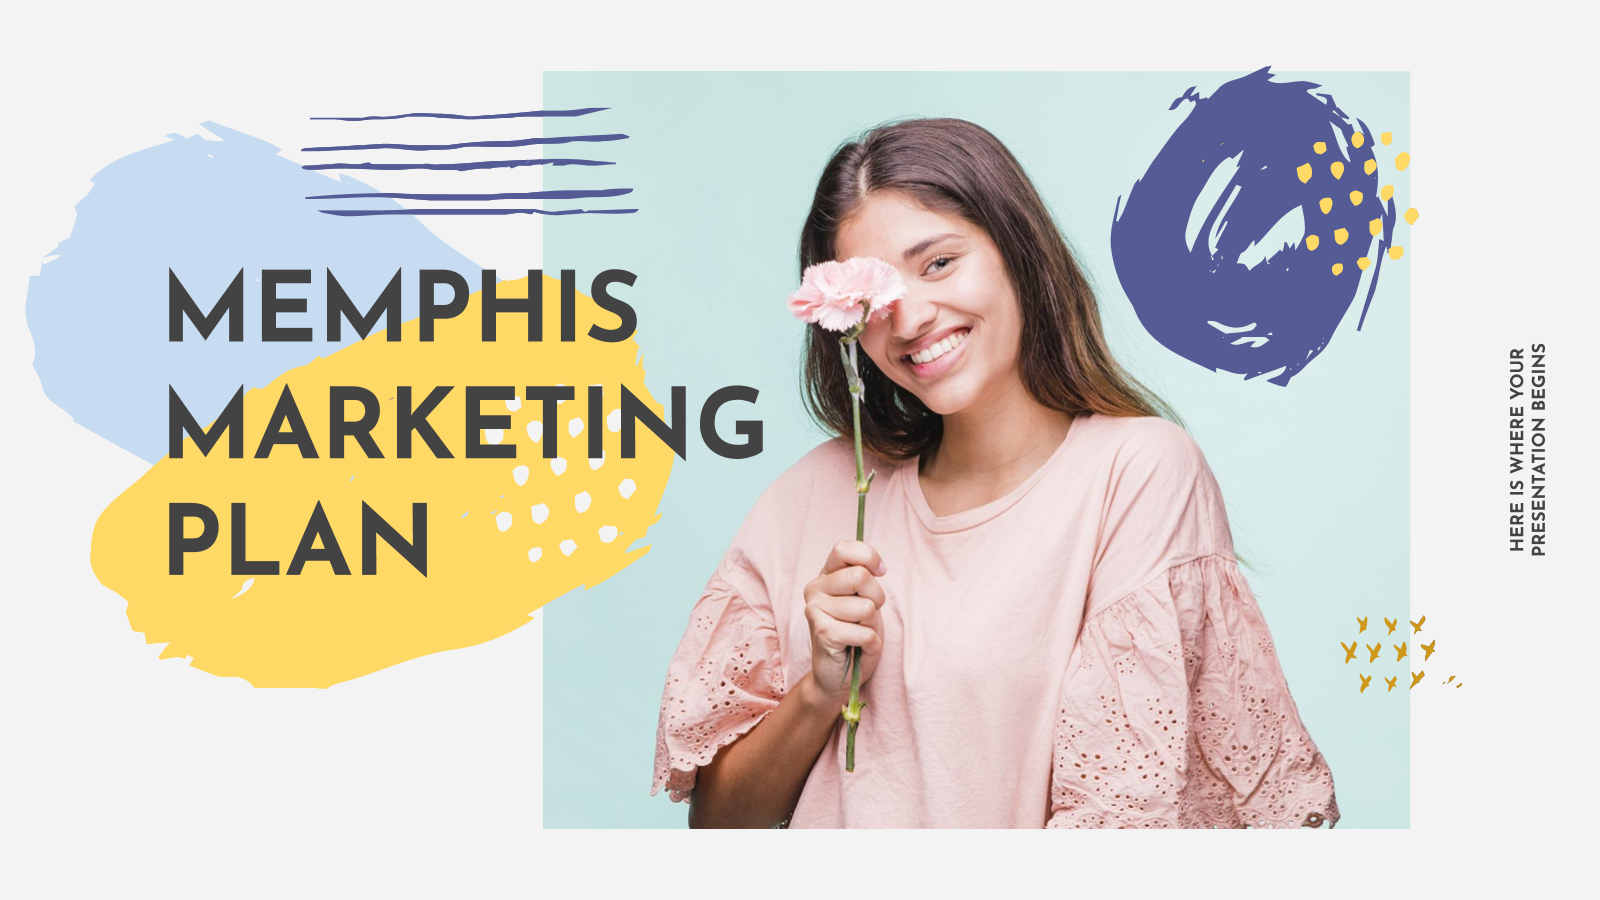 Memphis Marketing Plan presentation template